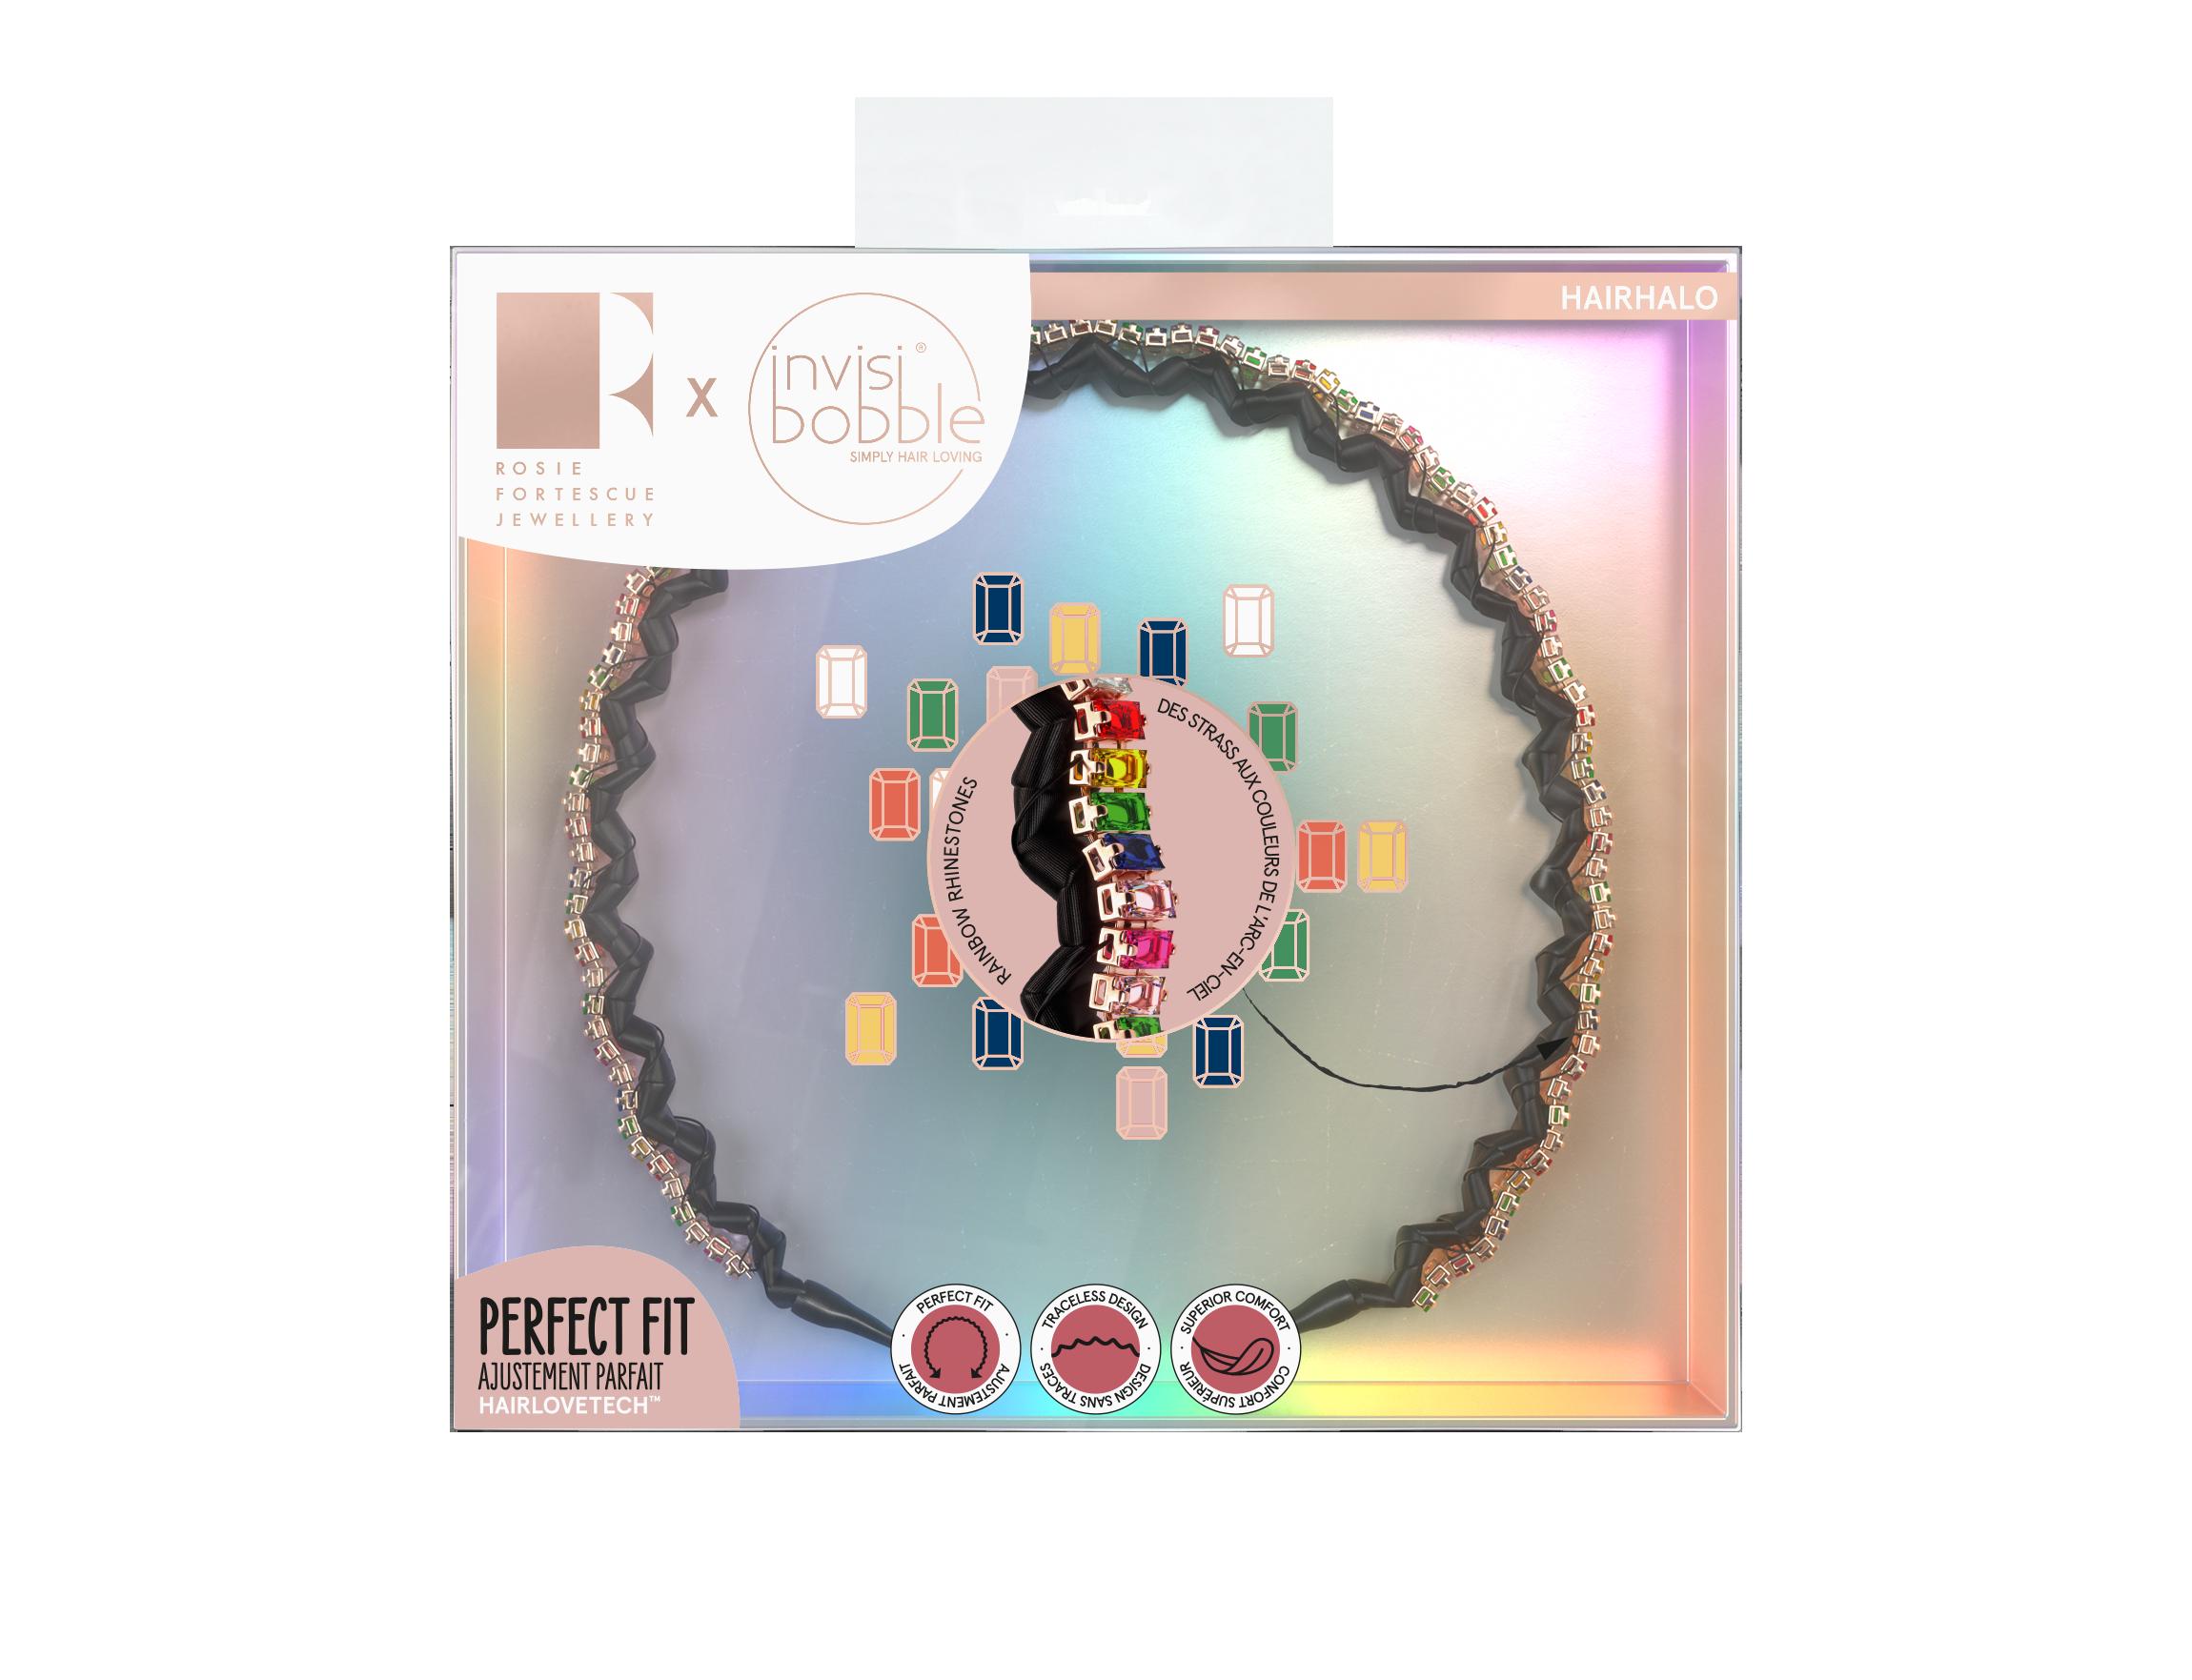 invisibobble® Rosie Fortescue Hair Halo Trendy Treasure